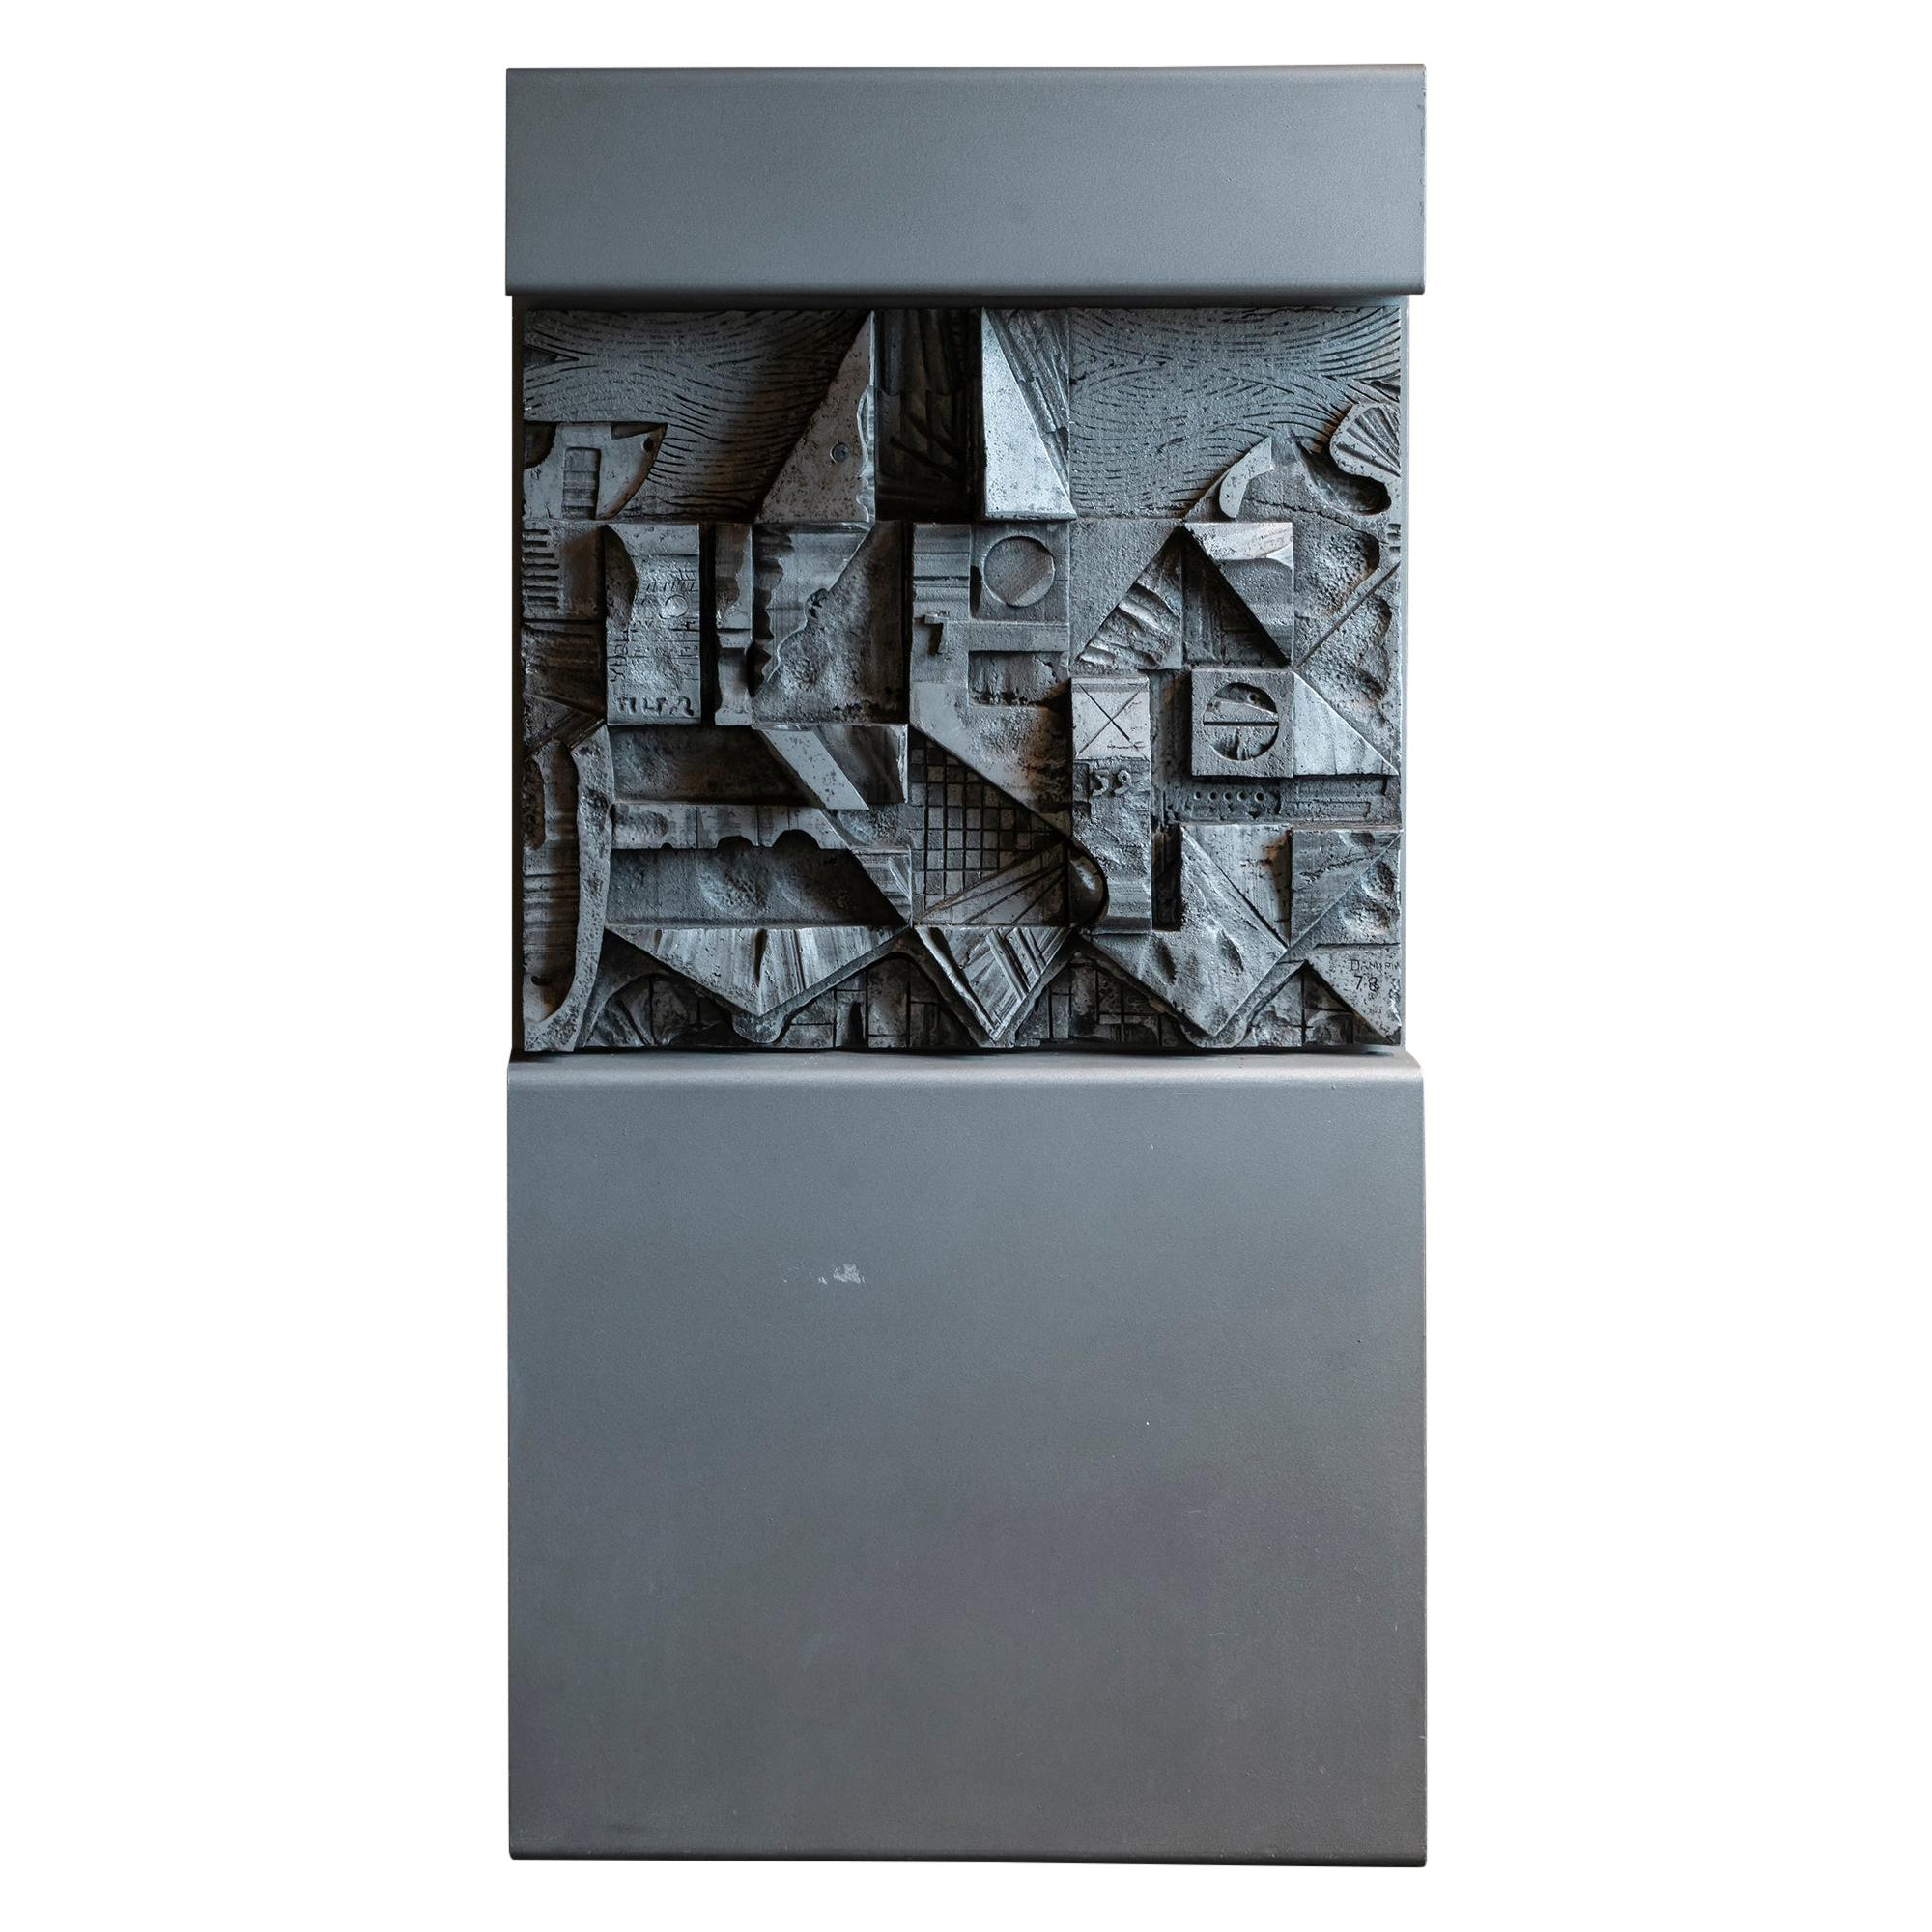 Carlo Damerini Freestanding Abstract Sculpture, Italy, 1978